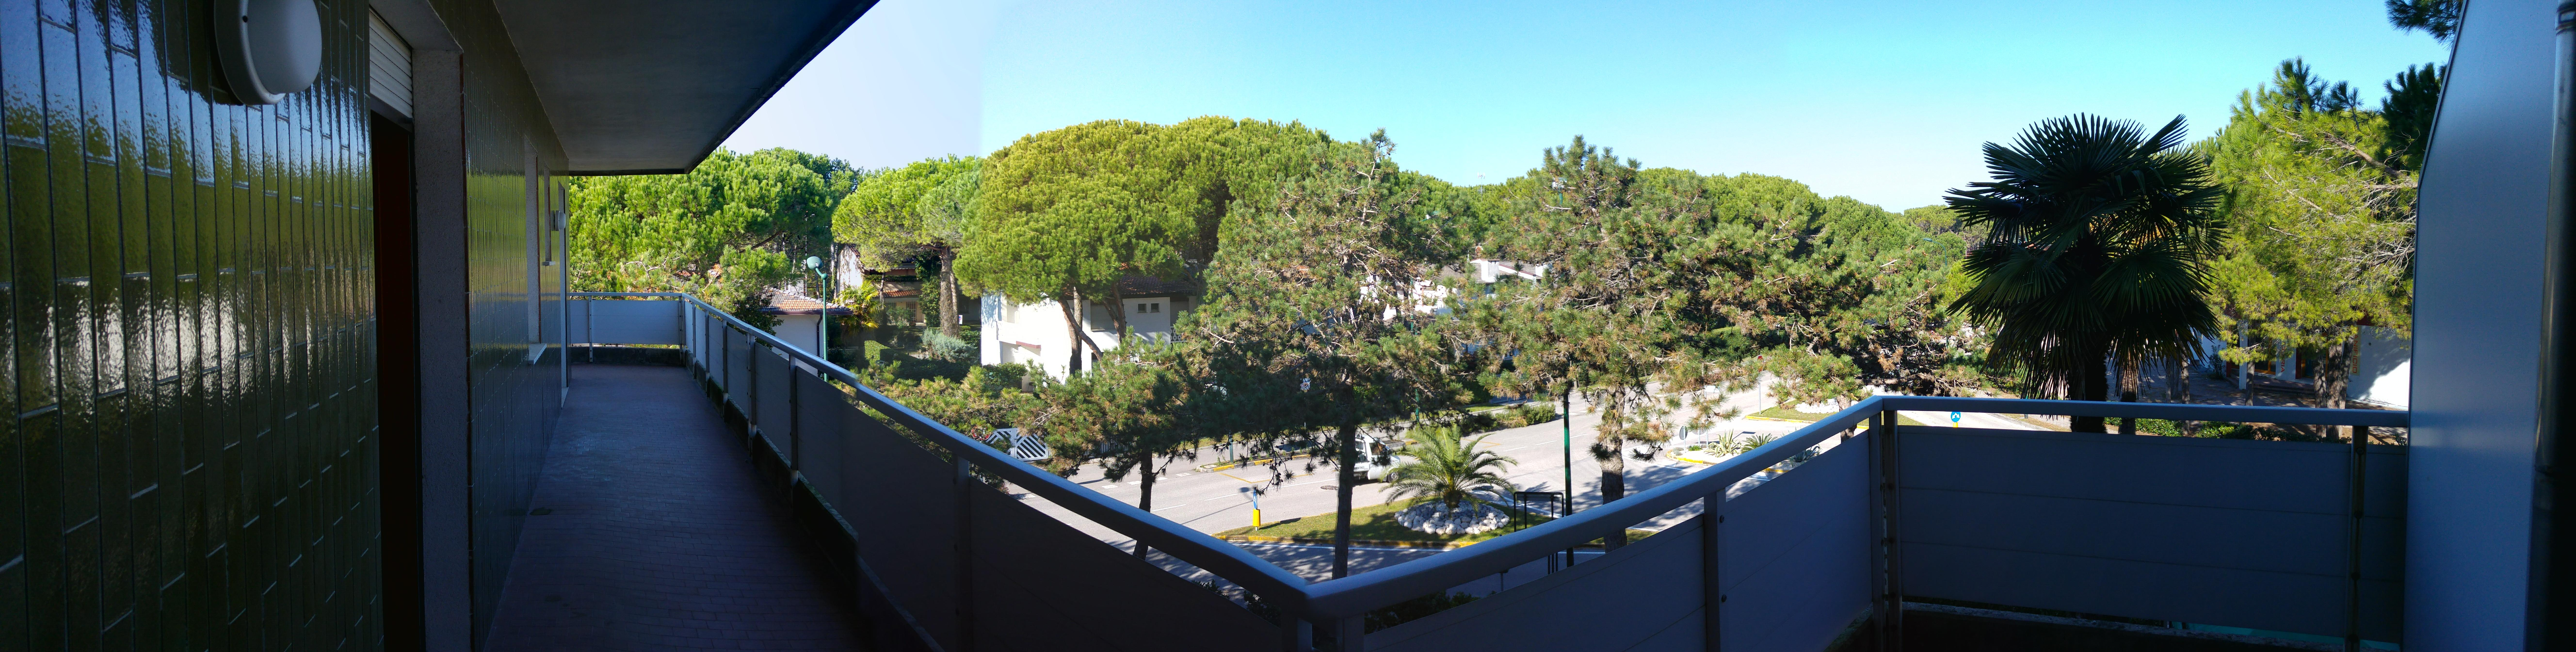 Capriccio_viewbalcony.jpg